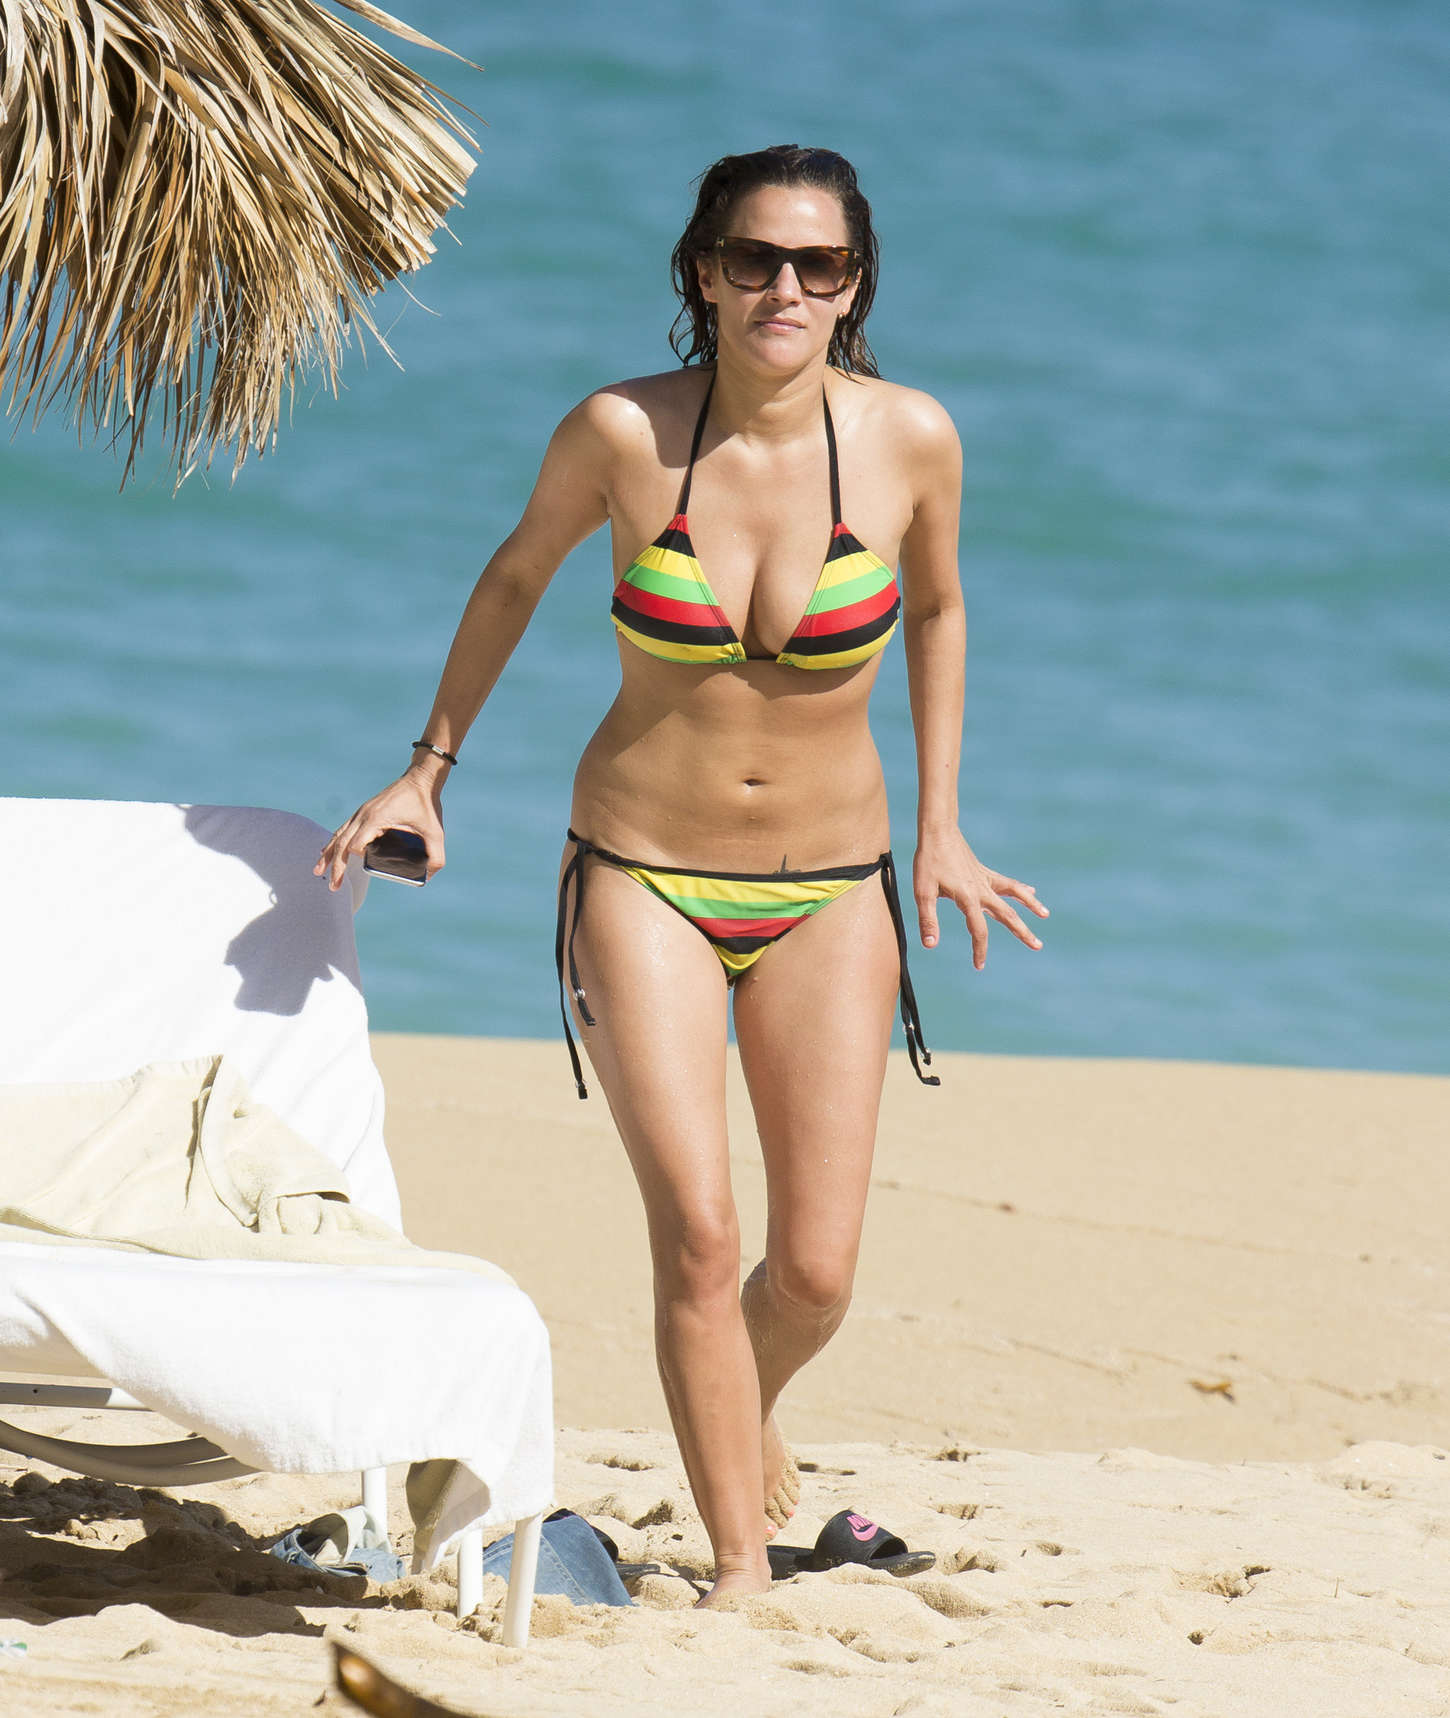 Caroline Flack in Bikini on the beach in Jamaica